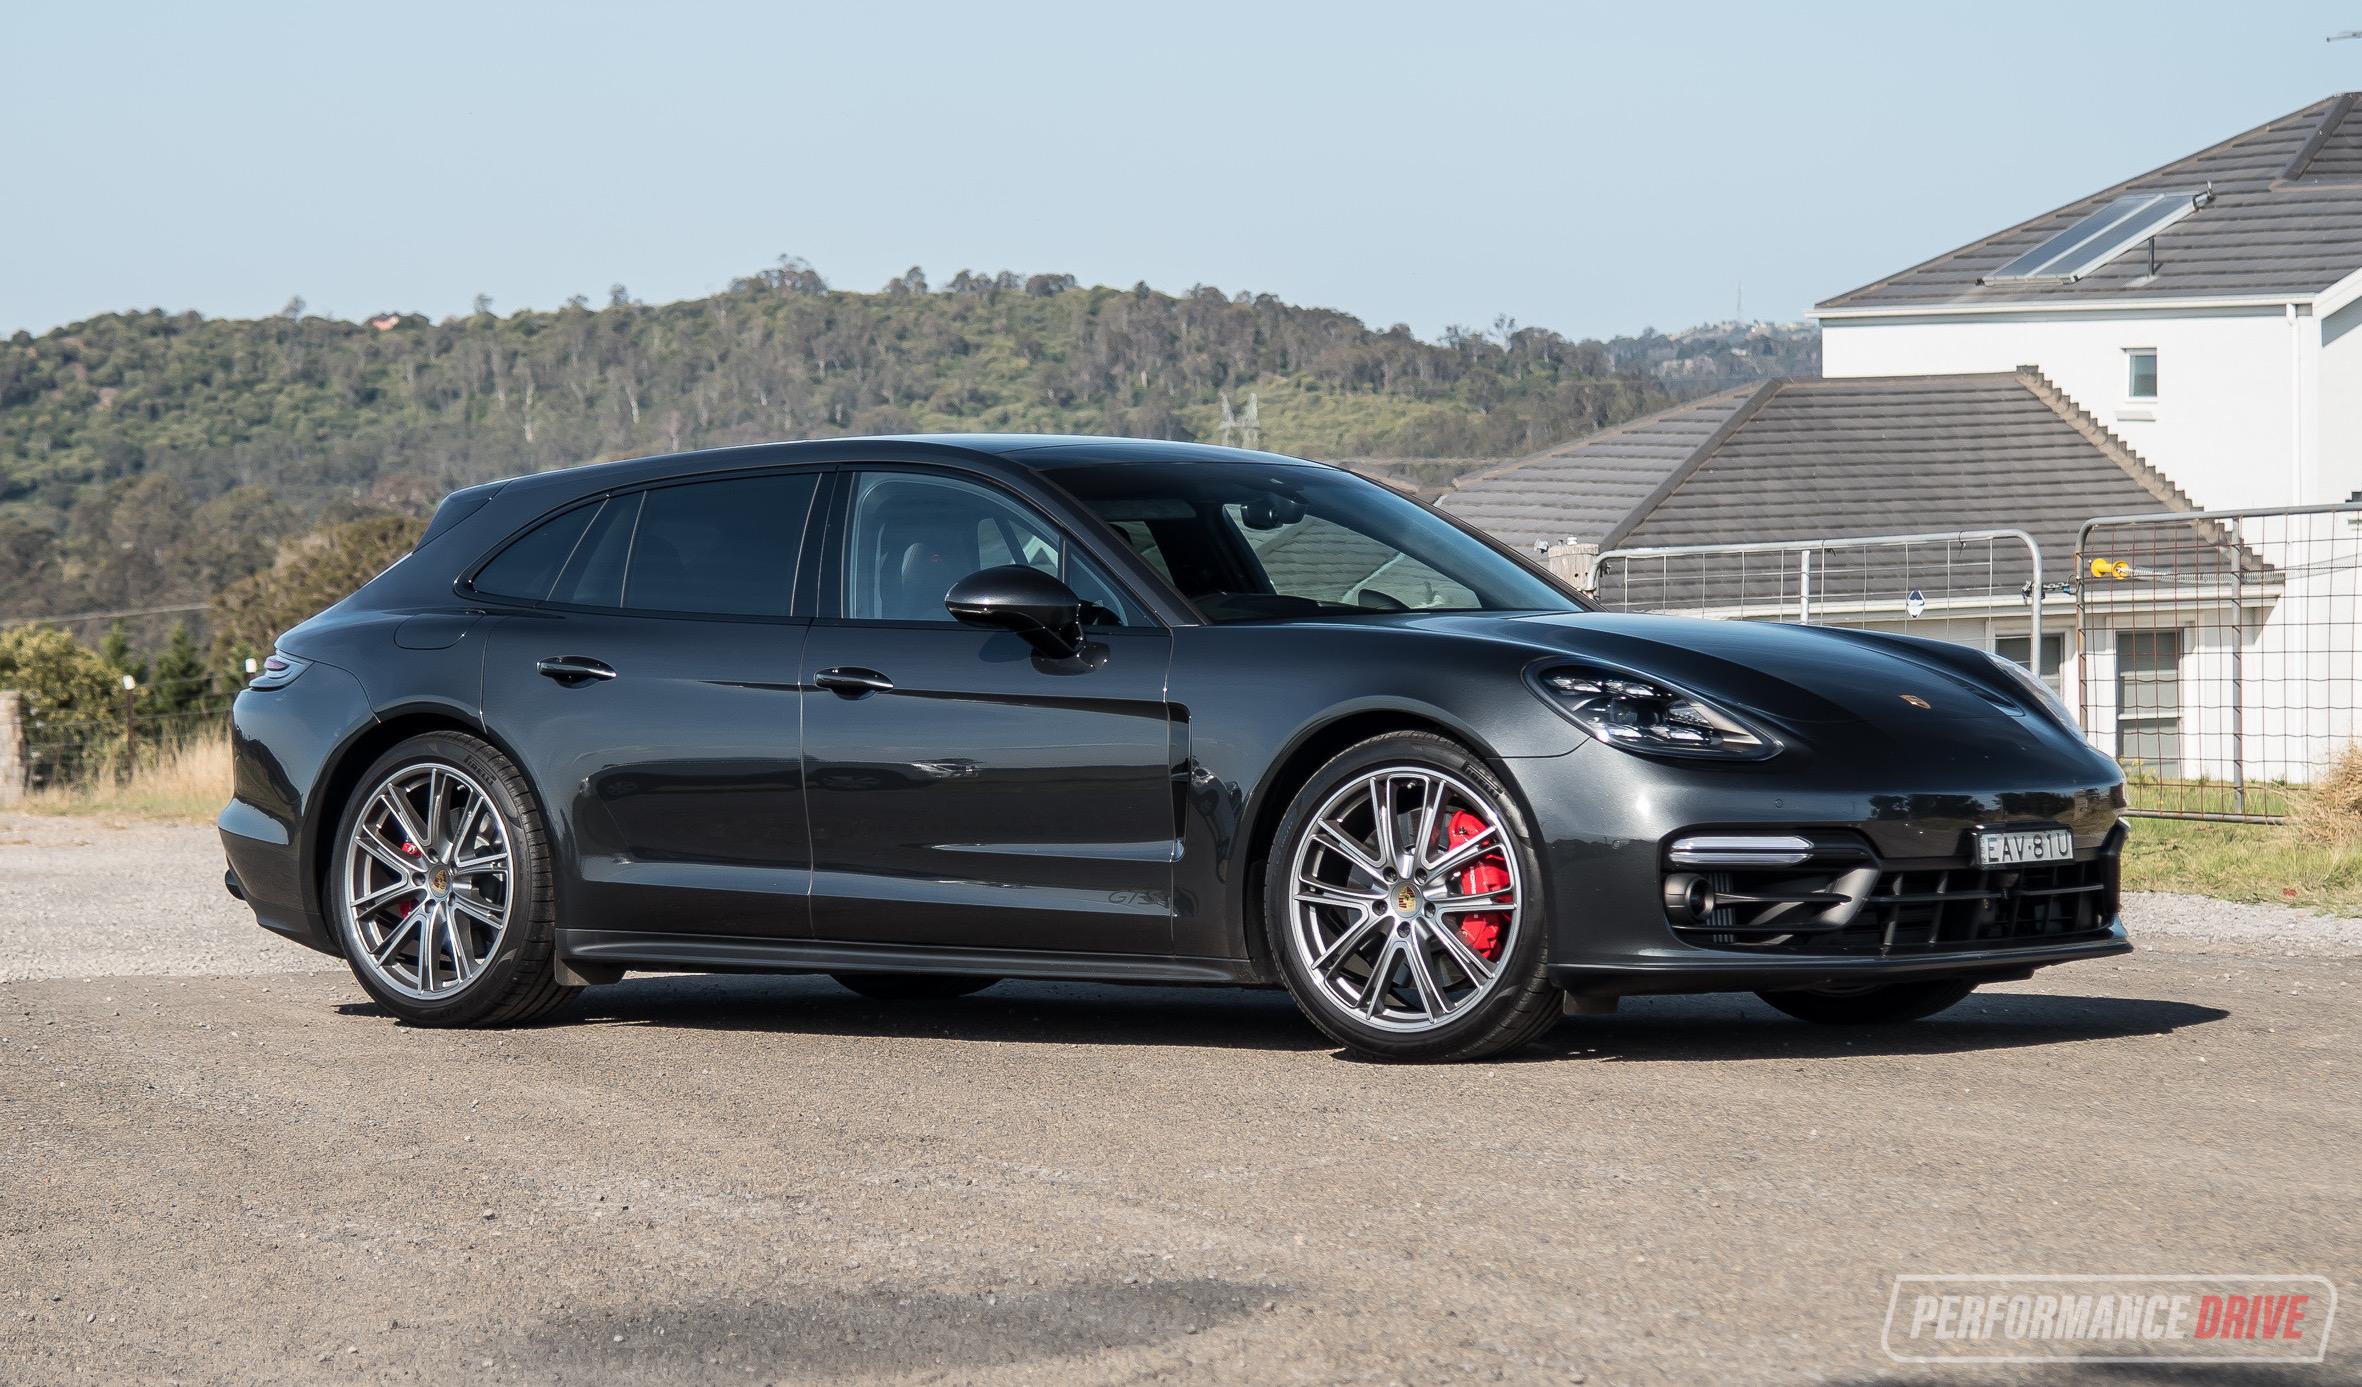 2019 Porsche Panamera Gts Sport Turismo Review Video Performancedrive